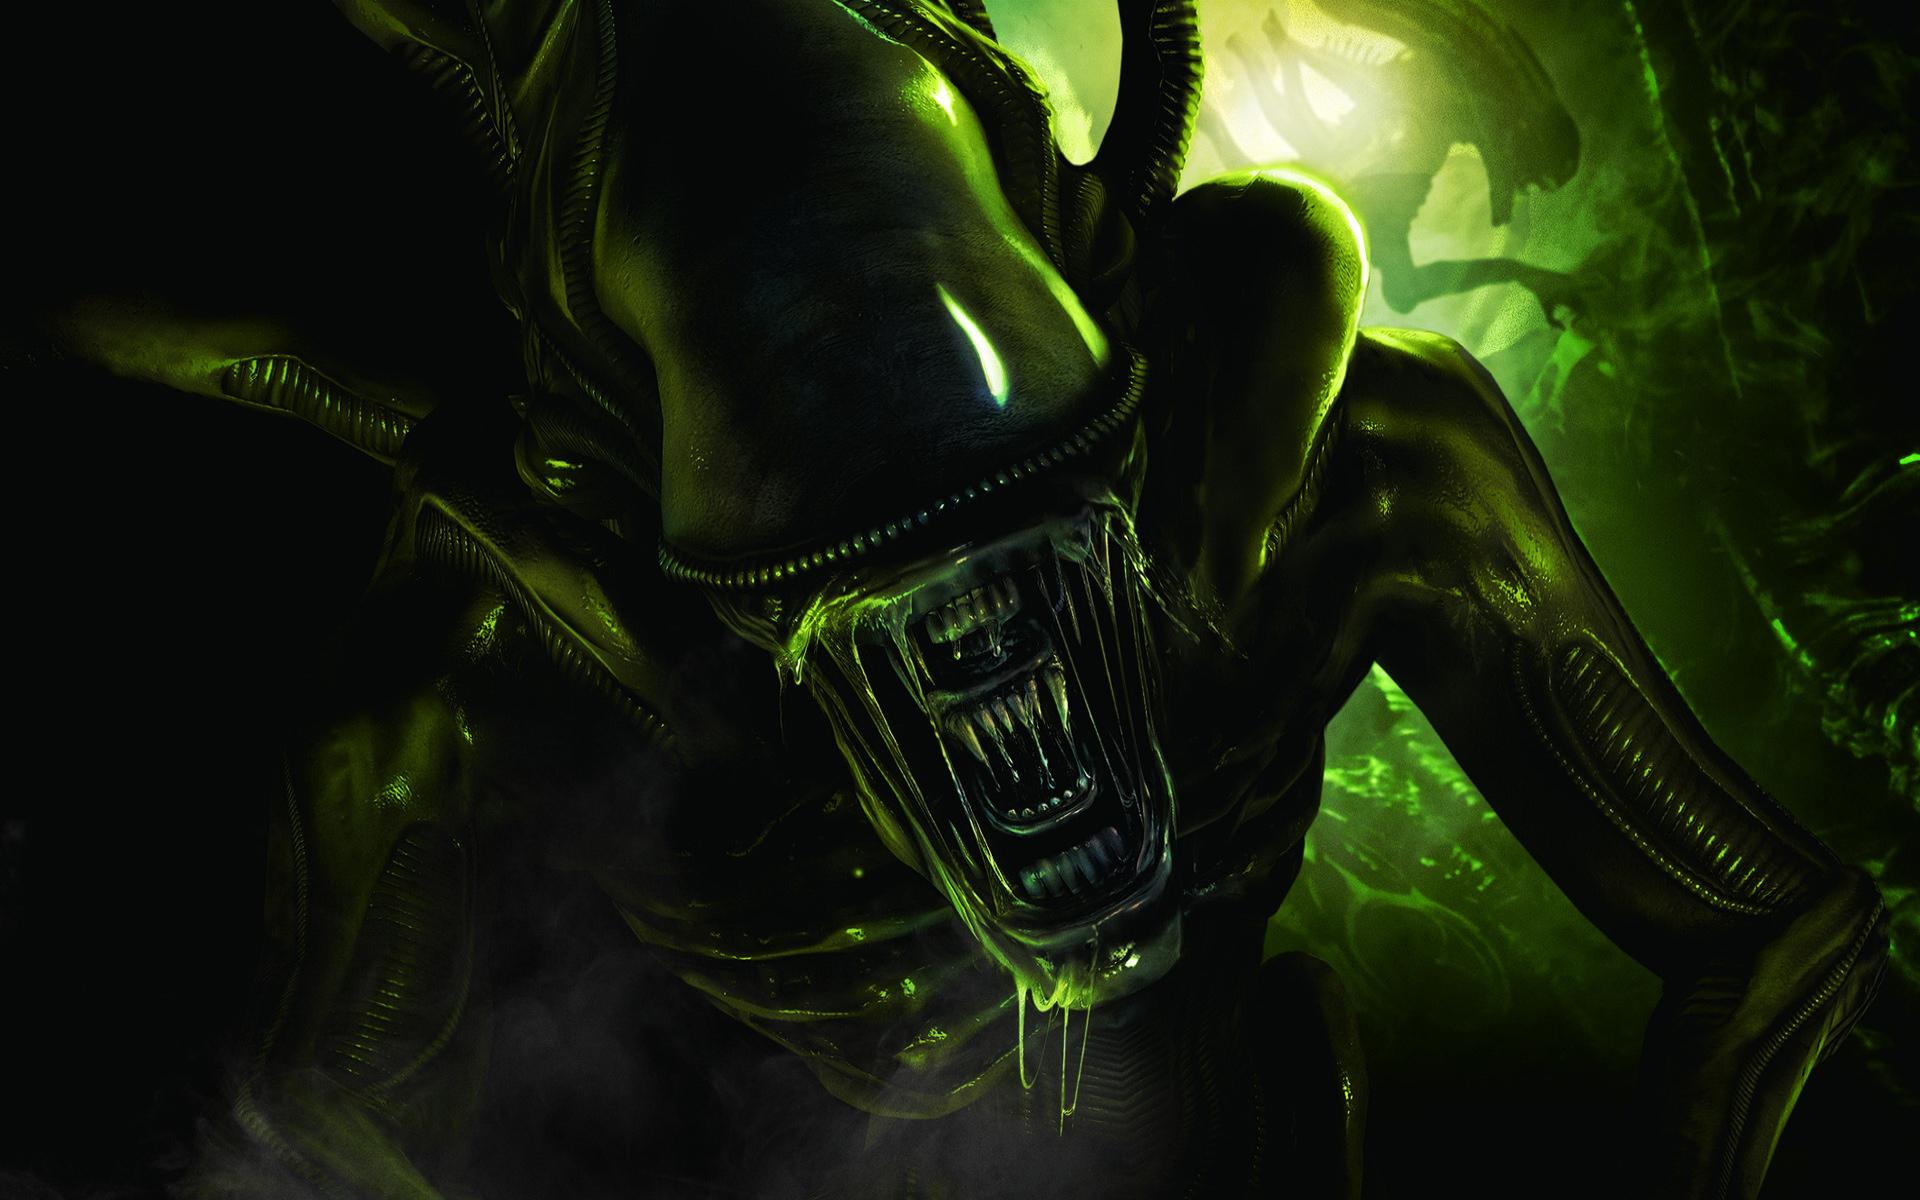 Alien Desktop Animated Movies wallpapers HD   180377 1920x1200